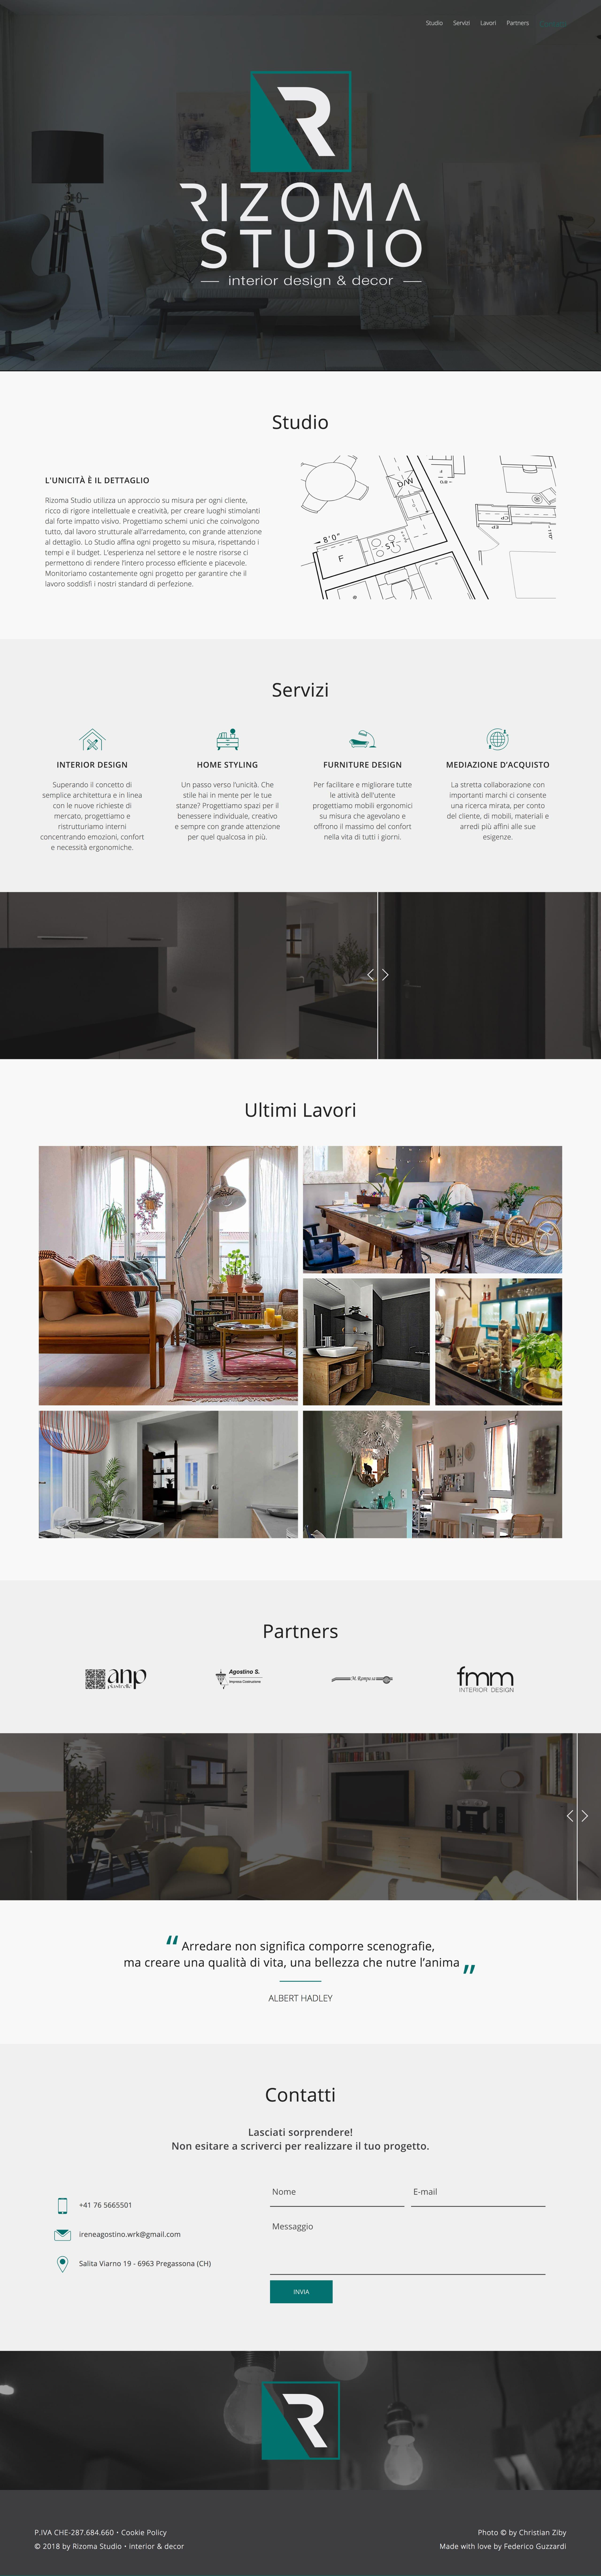 Rizoma Studio Website Screenshot